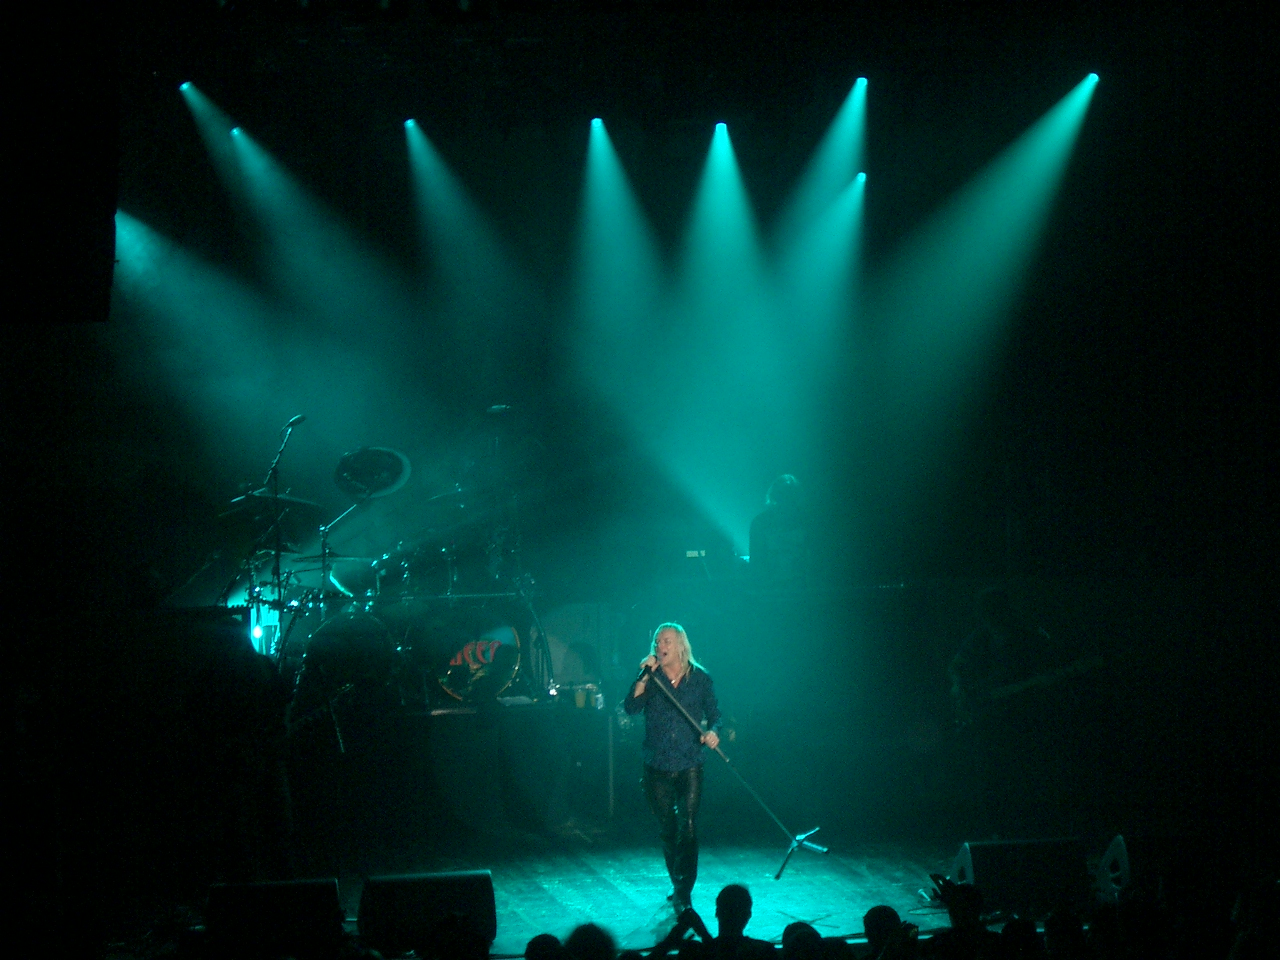 Tickets Show Uriah Heep